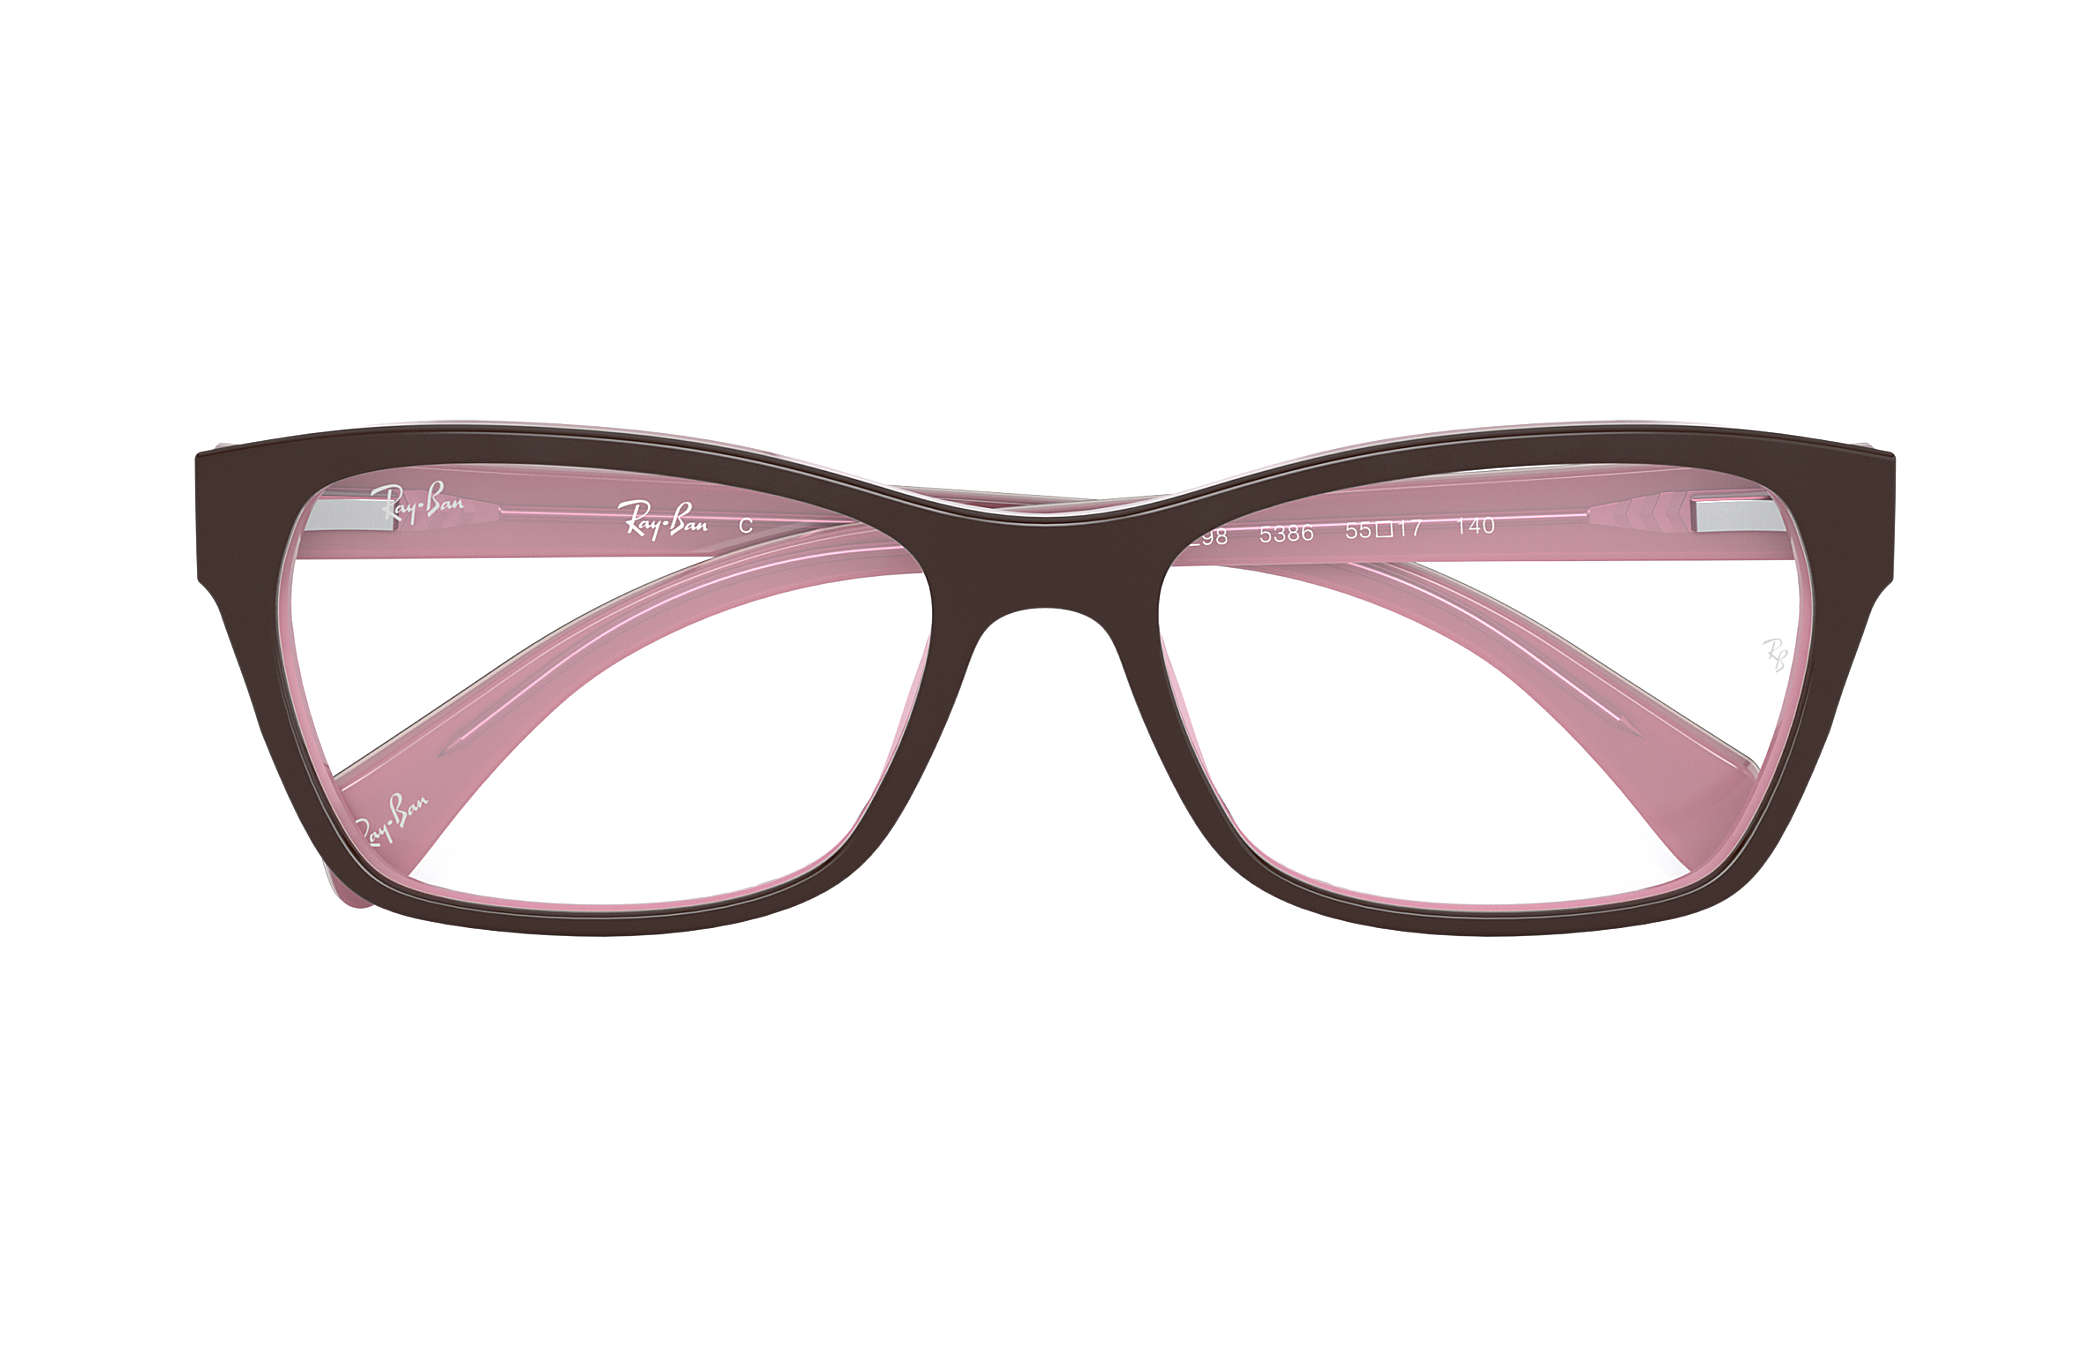 e015576a1d35 Ray-Ban prescription glasses RB5298 Brown - Acetate - 0RX5298538653 ...